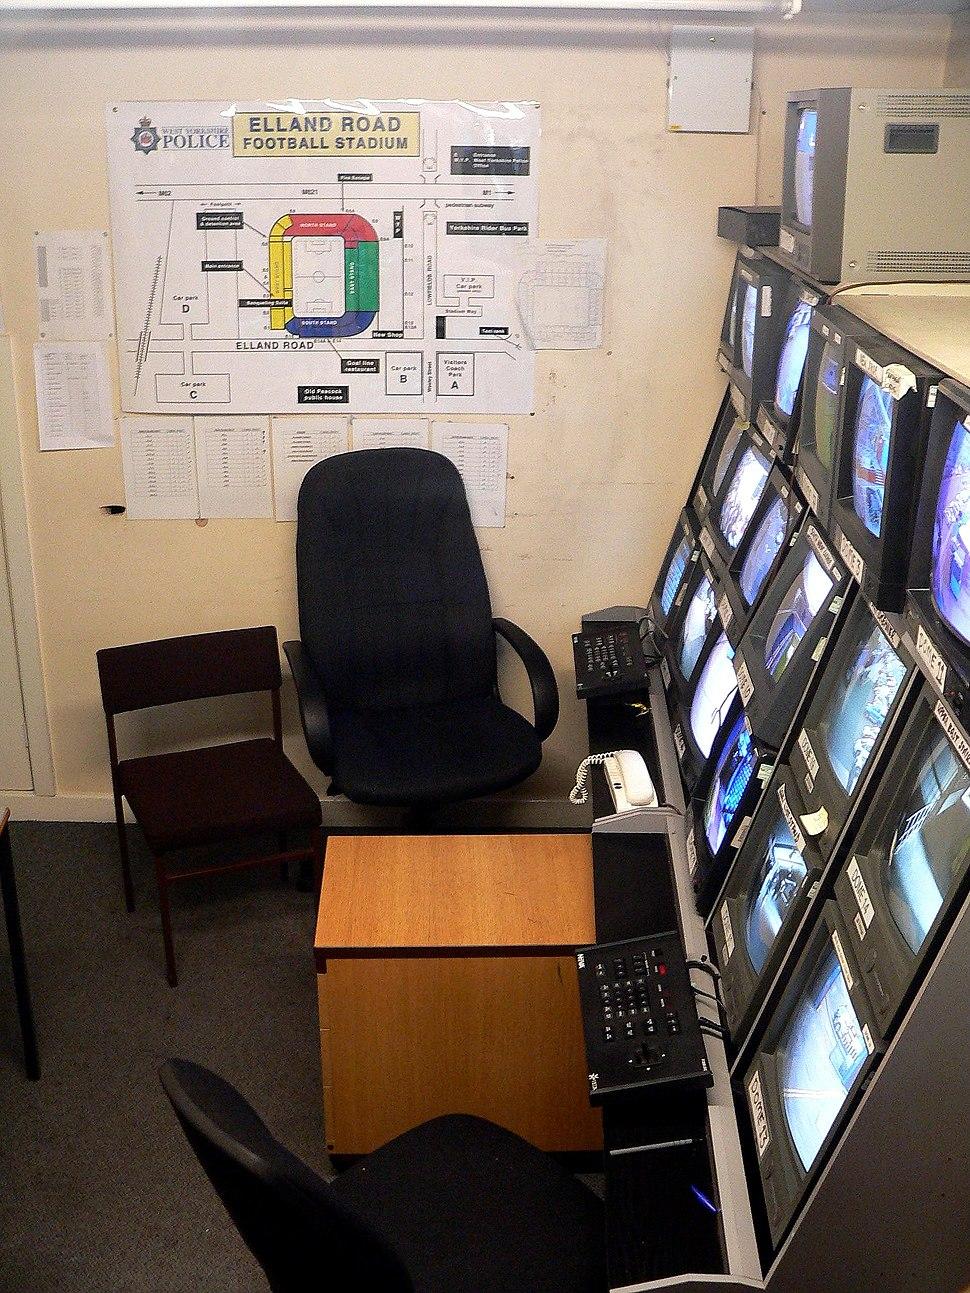 West Yorkshire Police control station at Elland Road